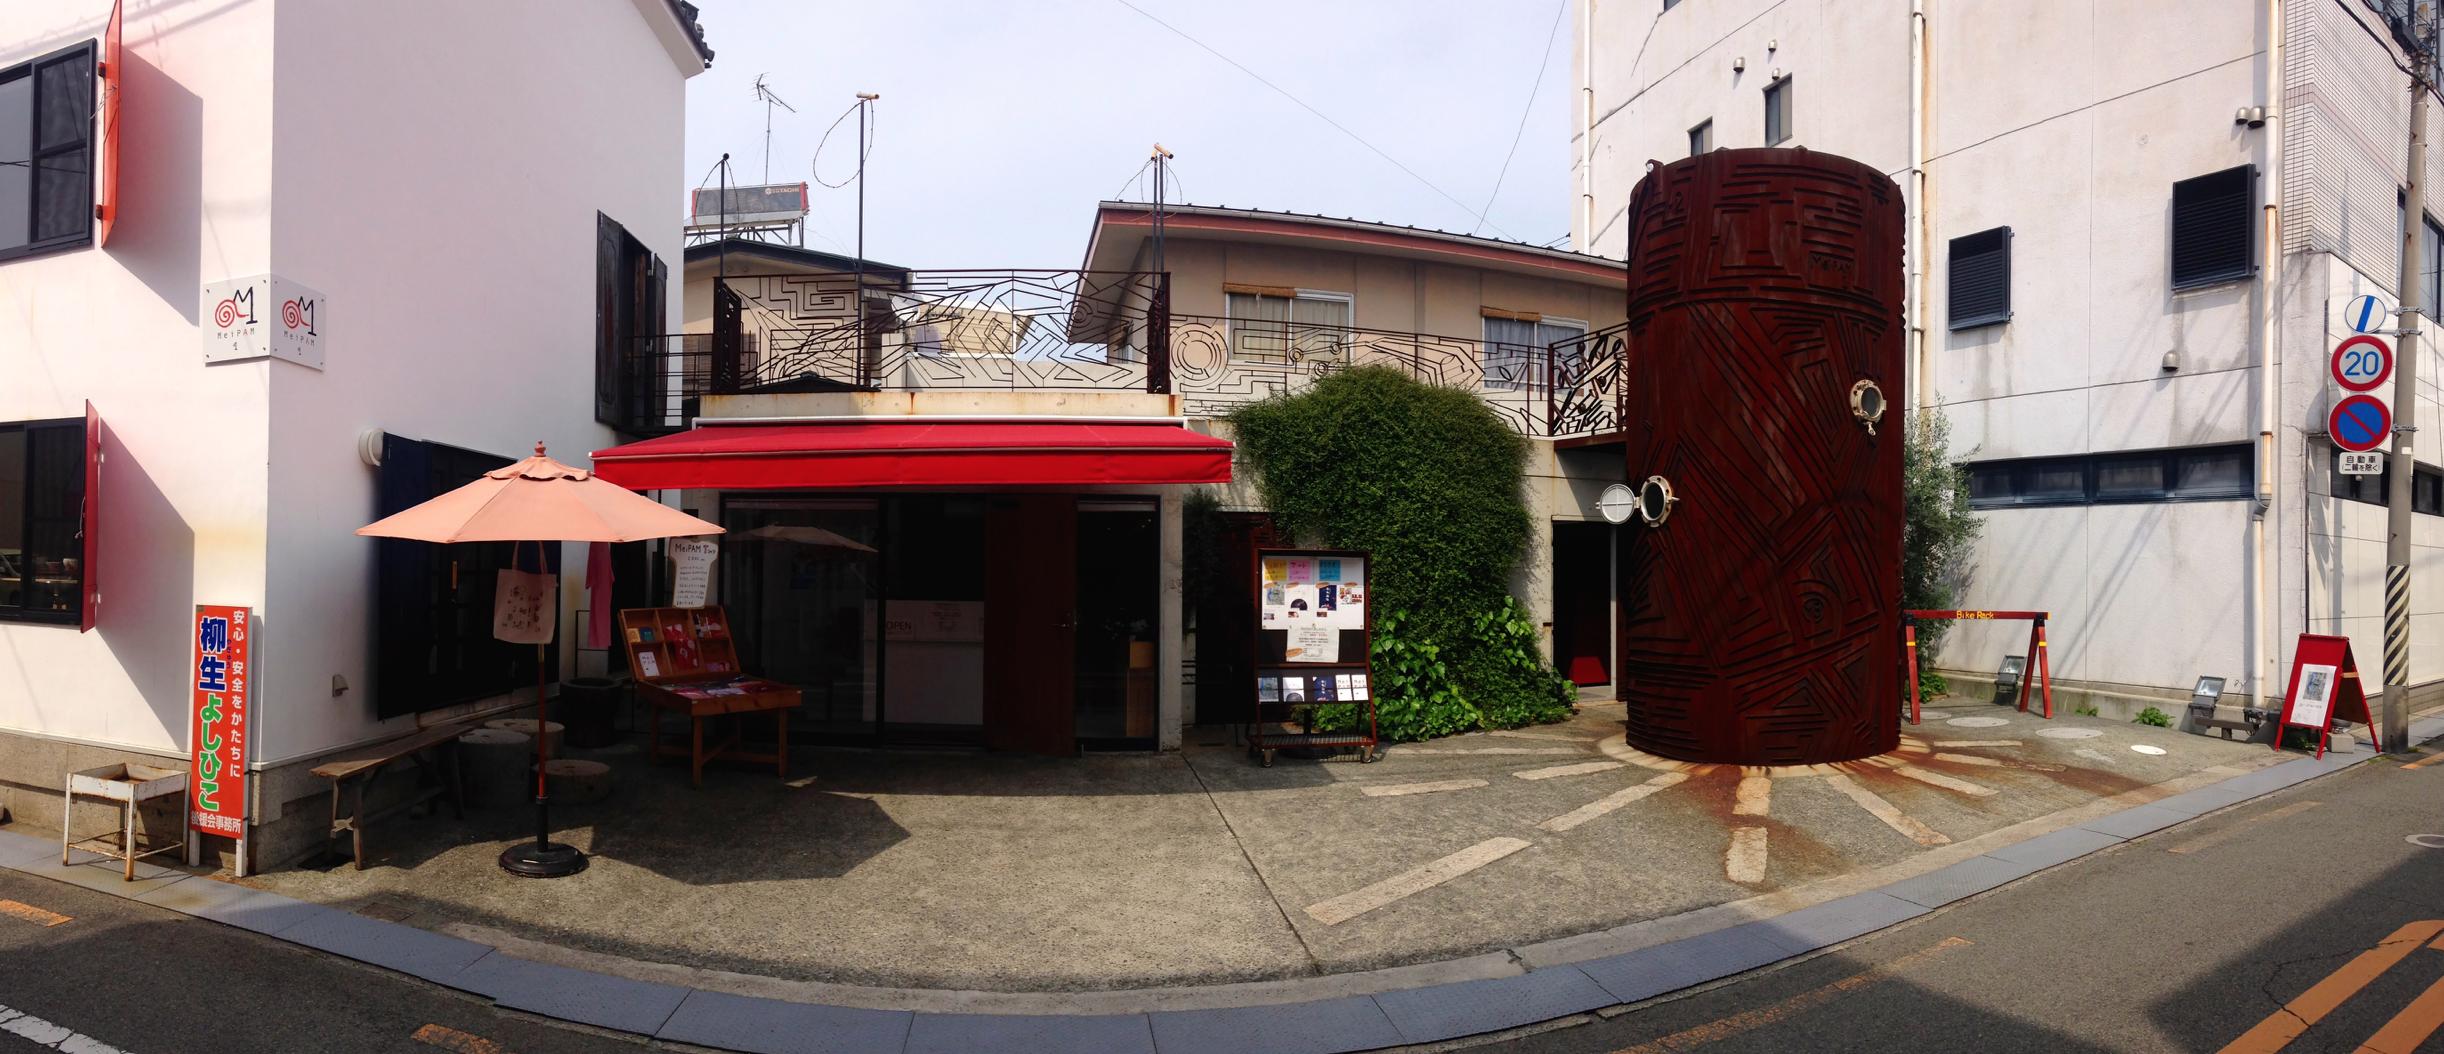 MeiPAM Gallery